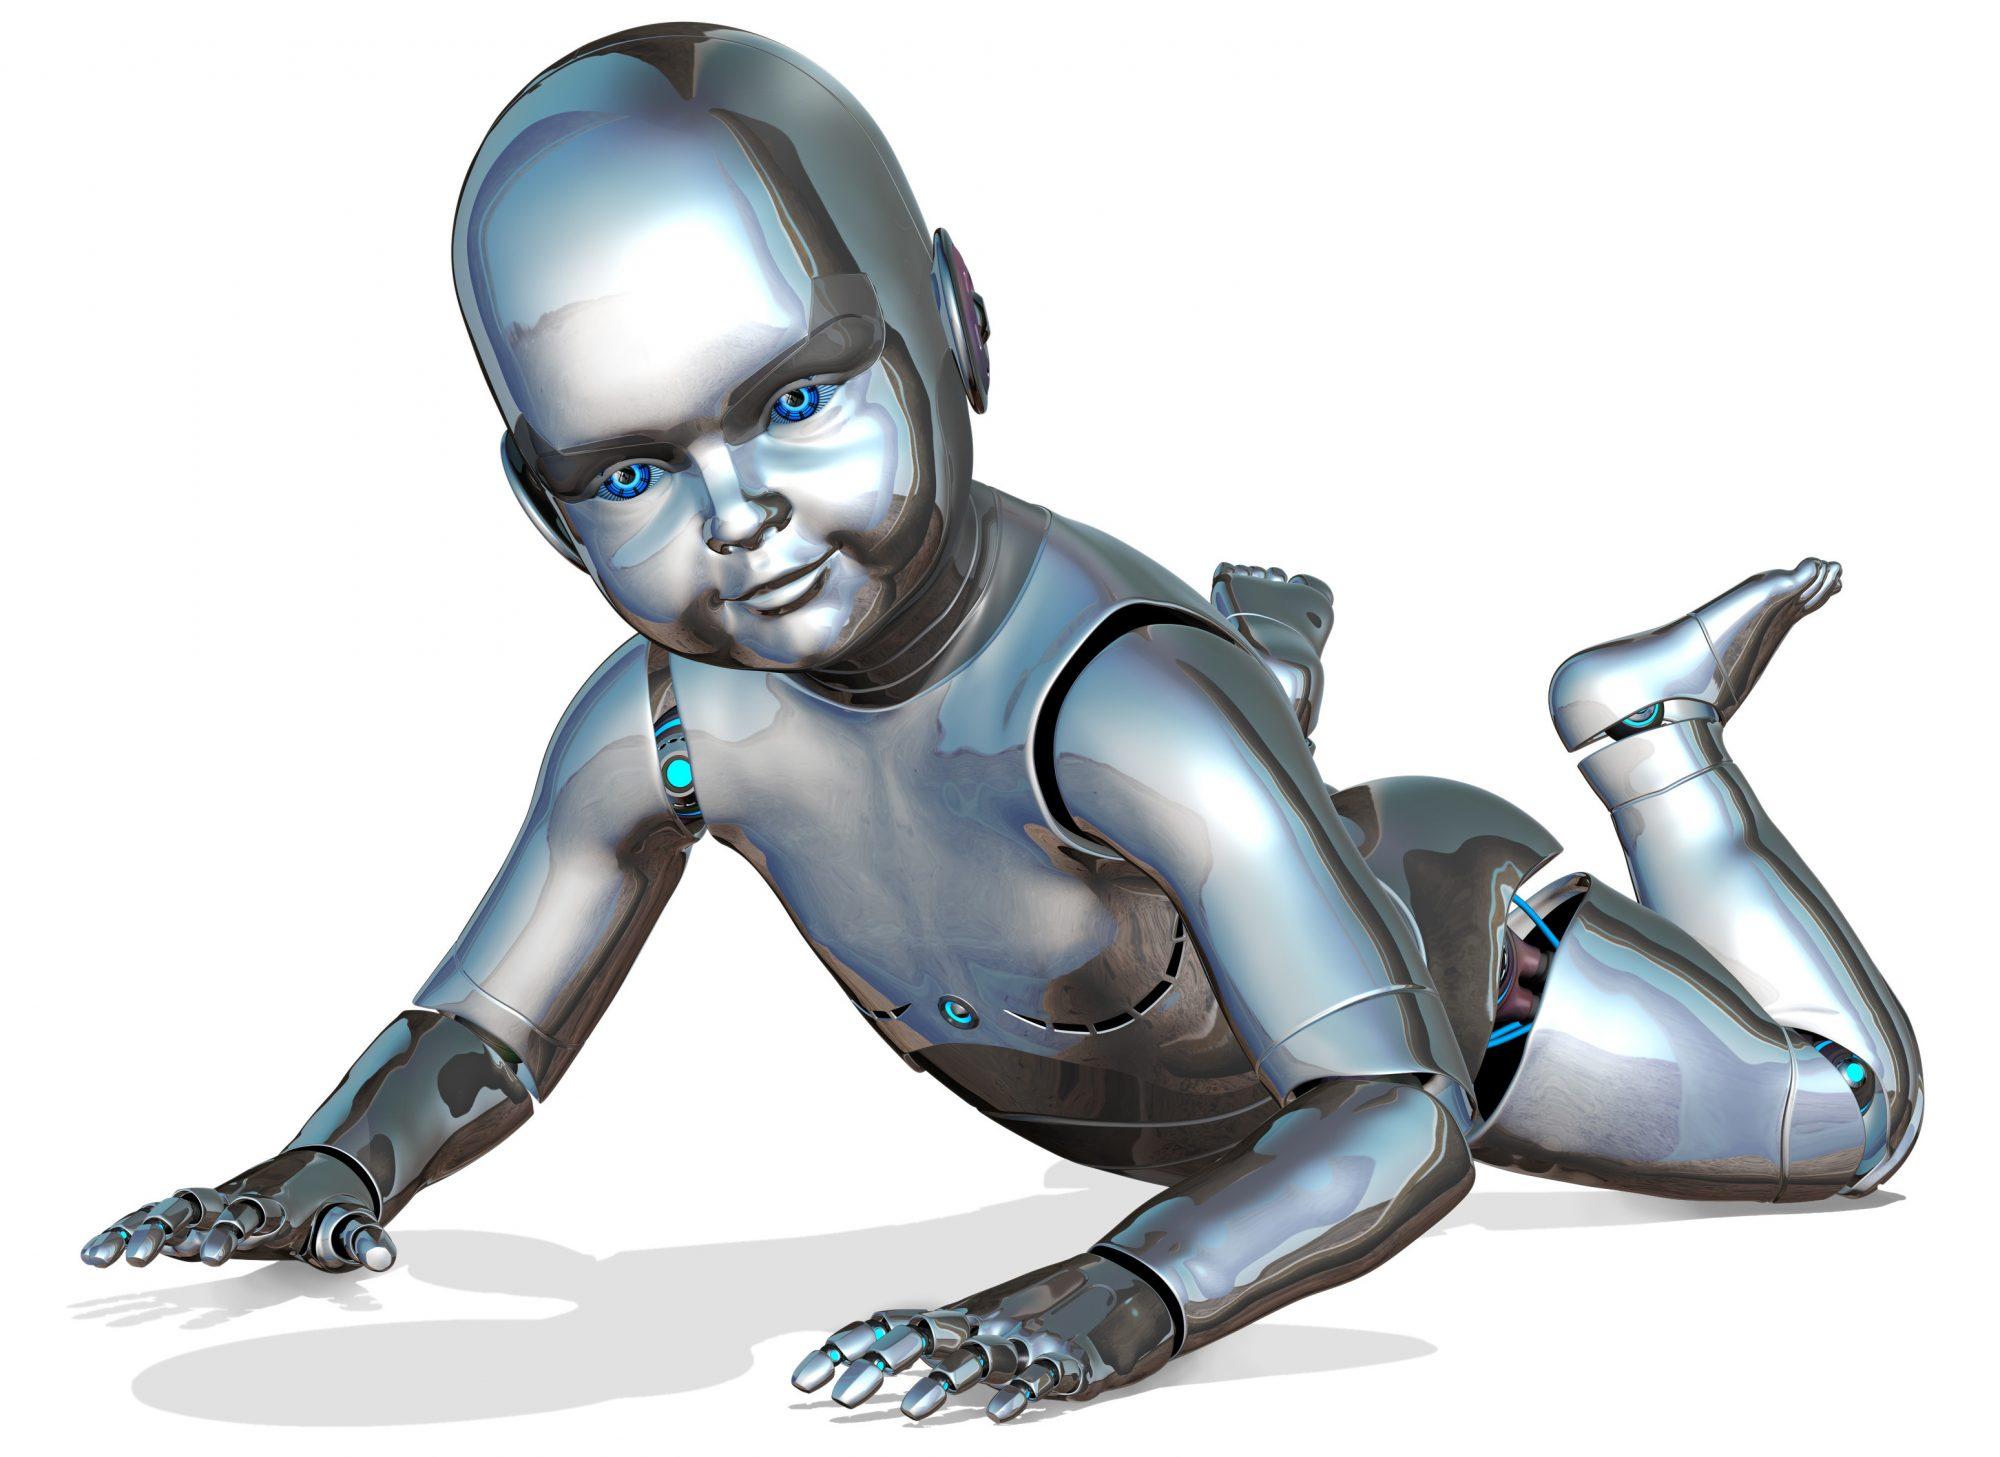 Cyborg Infancy